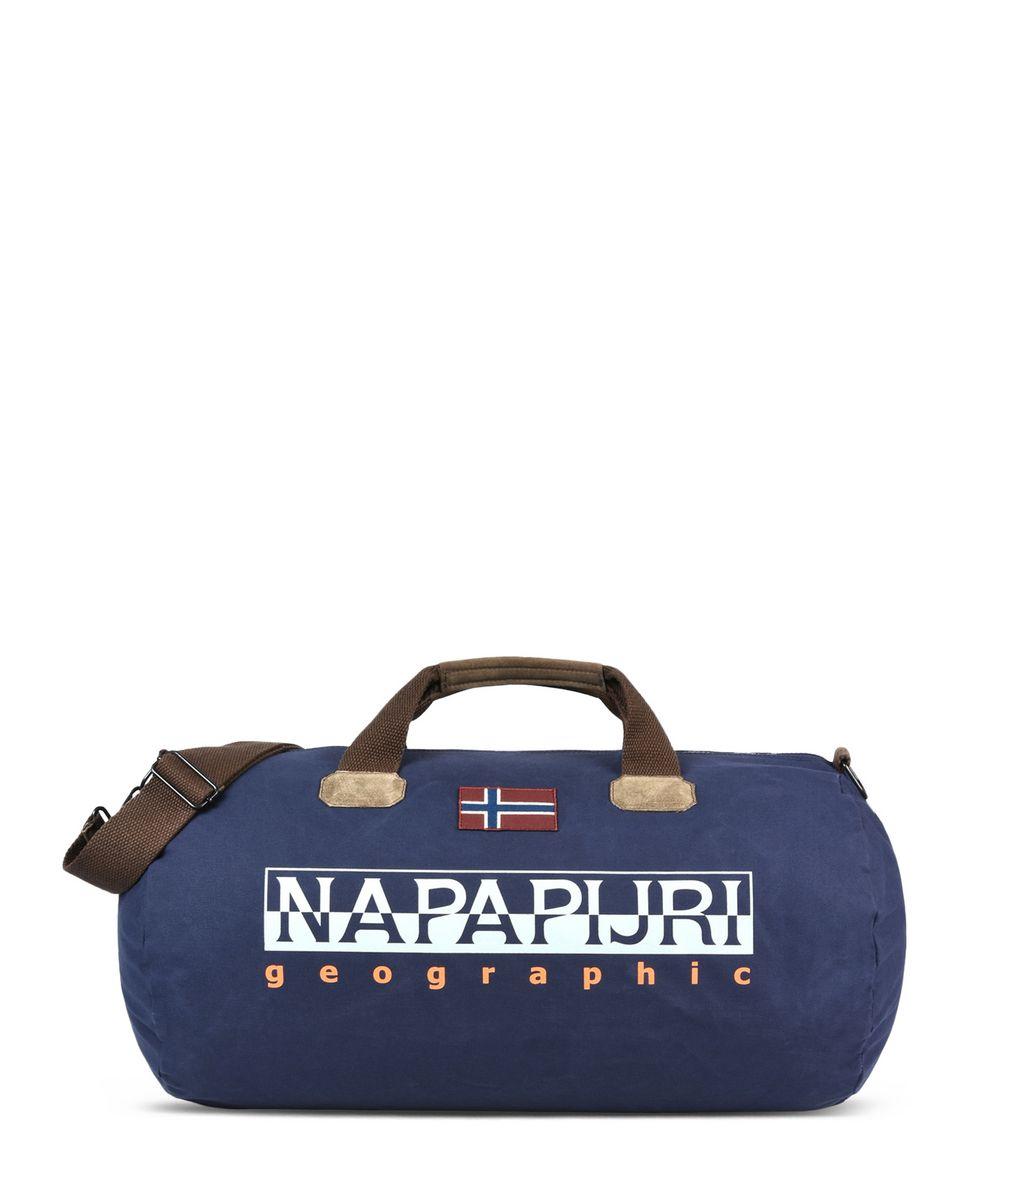 NAPAPIJRI BERING  TRAVEL BAG,DARK BLUE